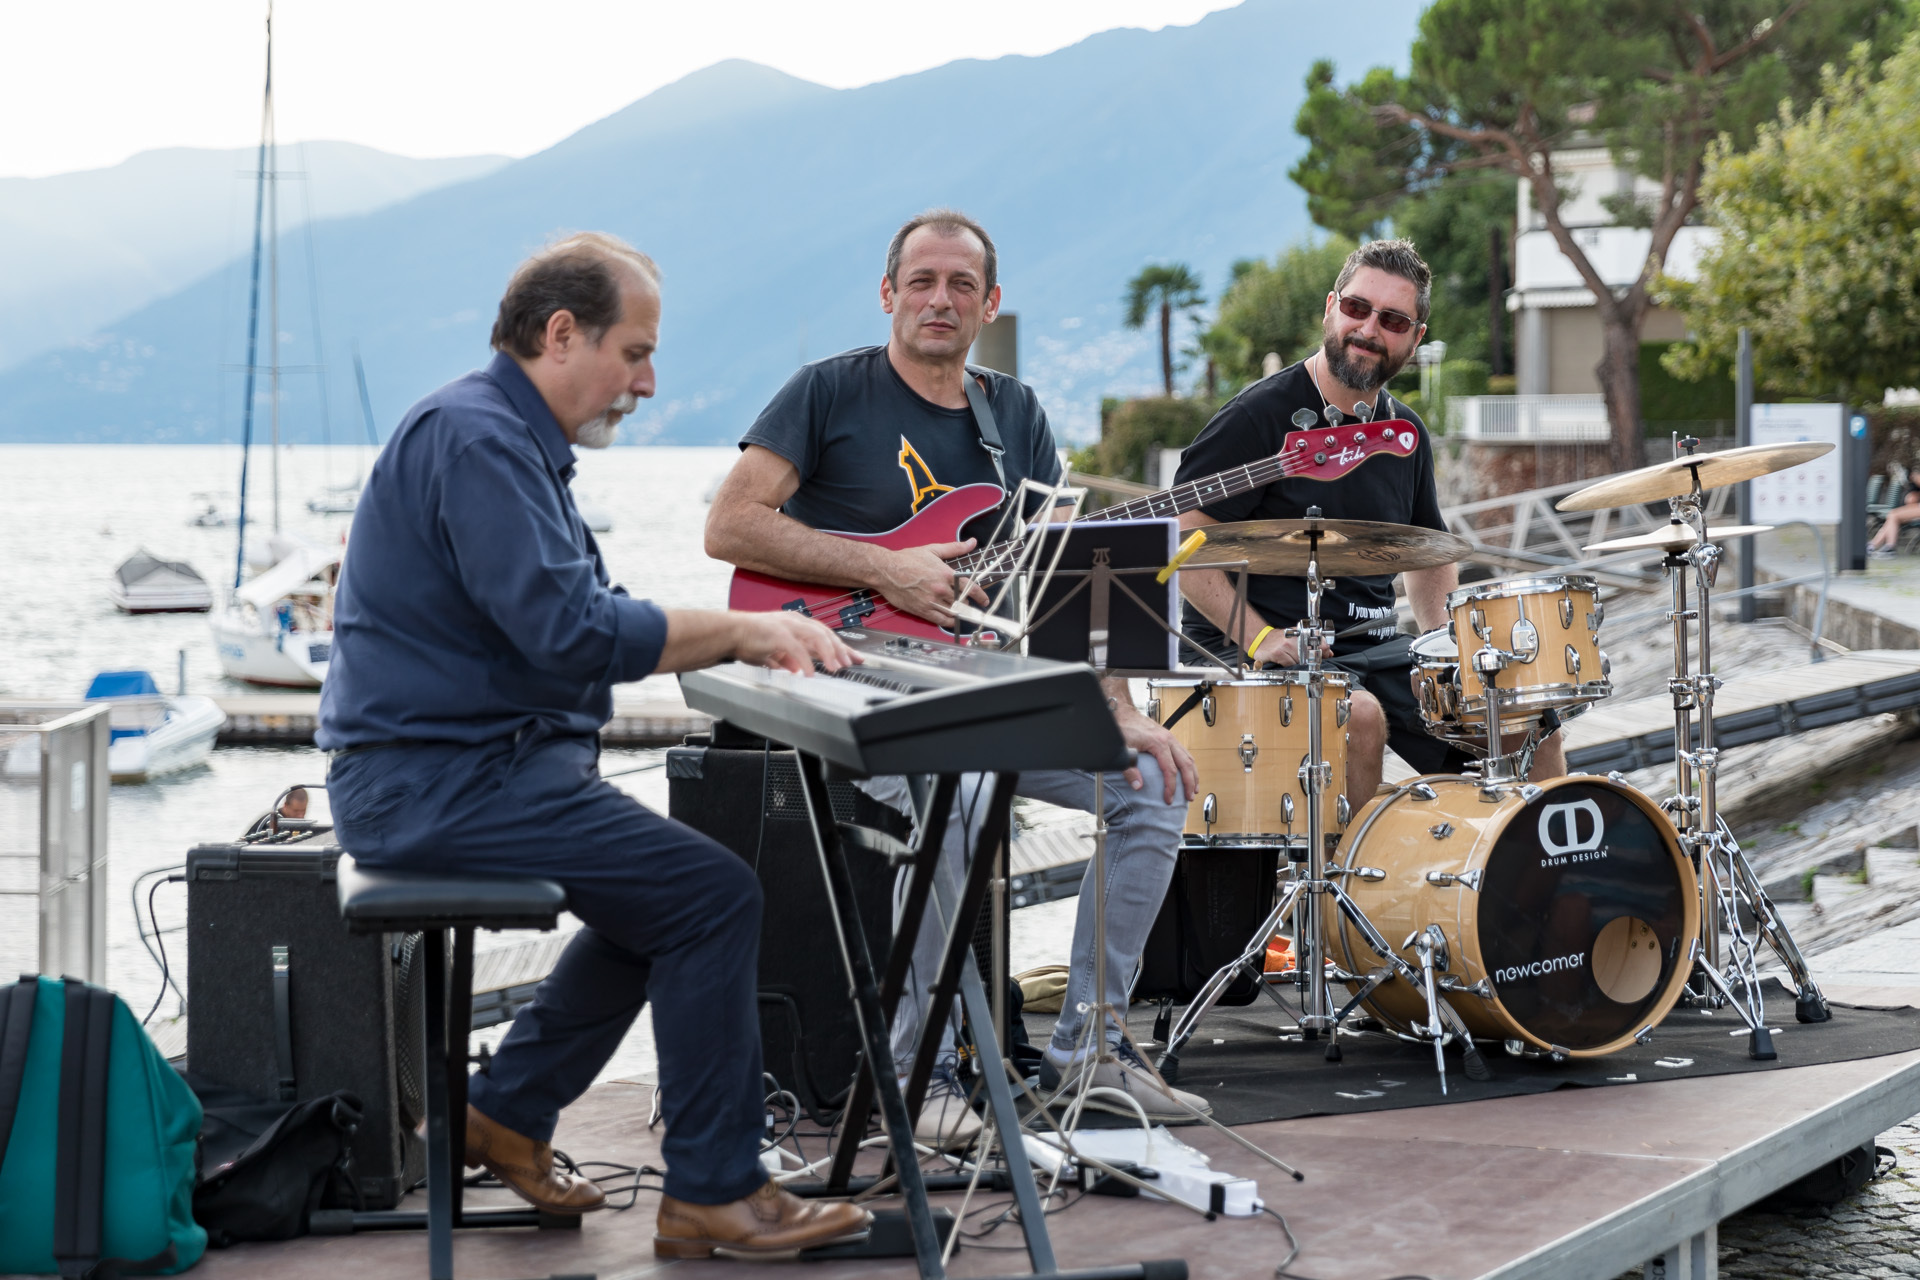 2018_08_18-Ascona-Jazz-Night-©-Luca-Vantusso-5D4A2303